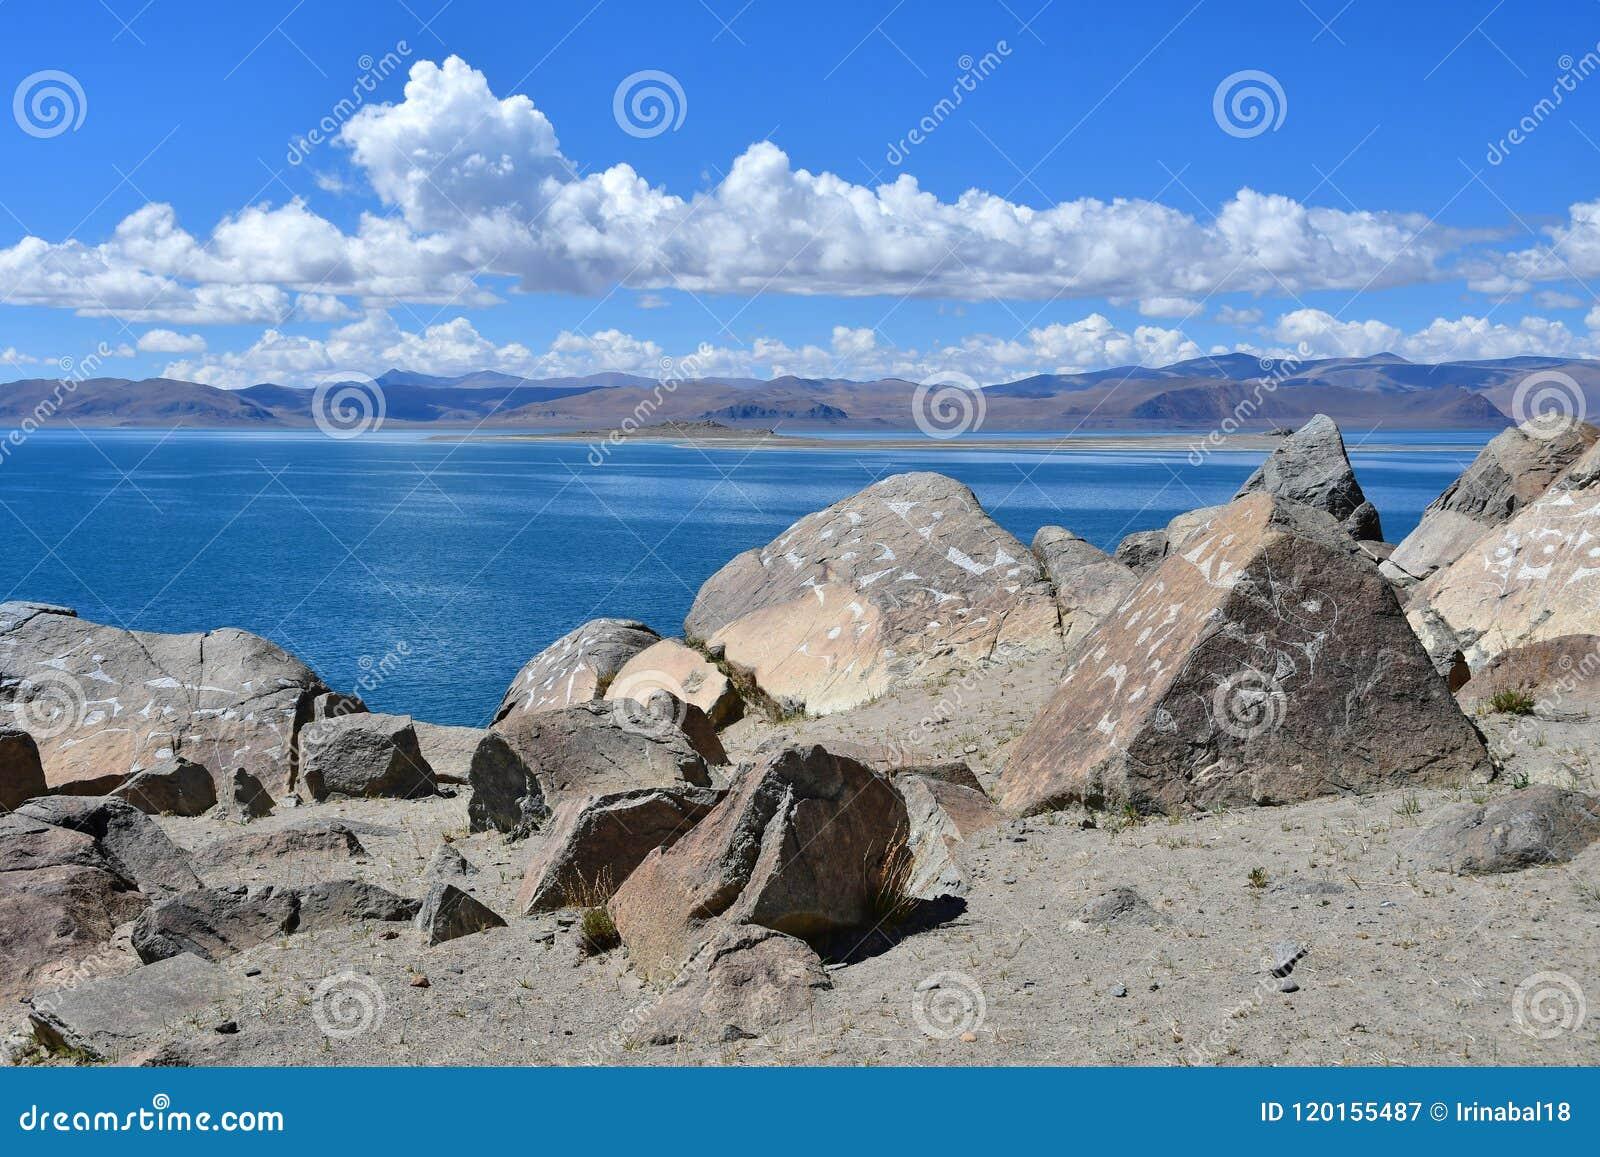 China. Great lakes of Tibet. Lake Teri Tashi Namtso in sunny summer day